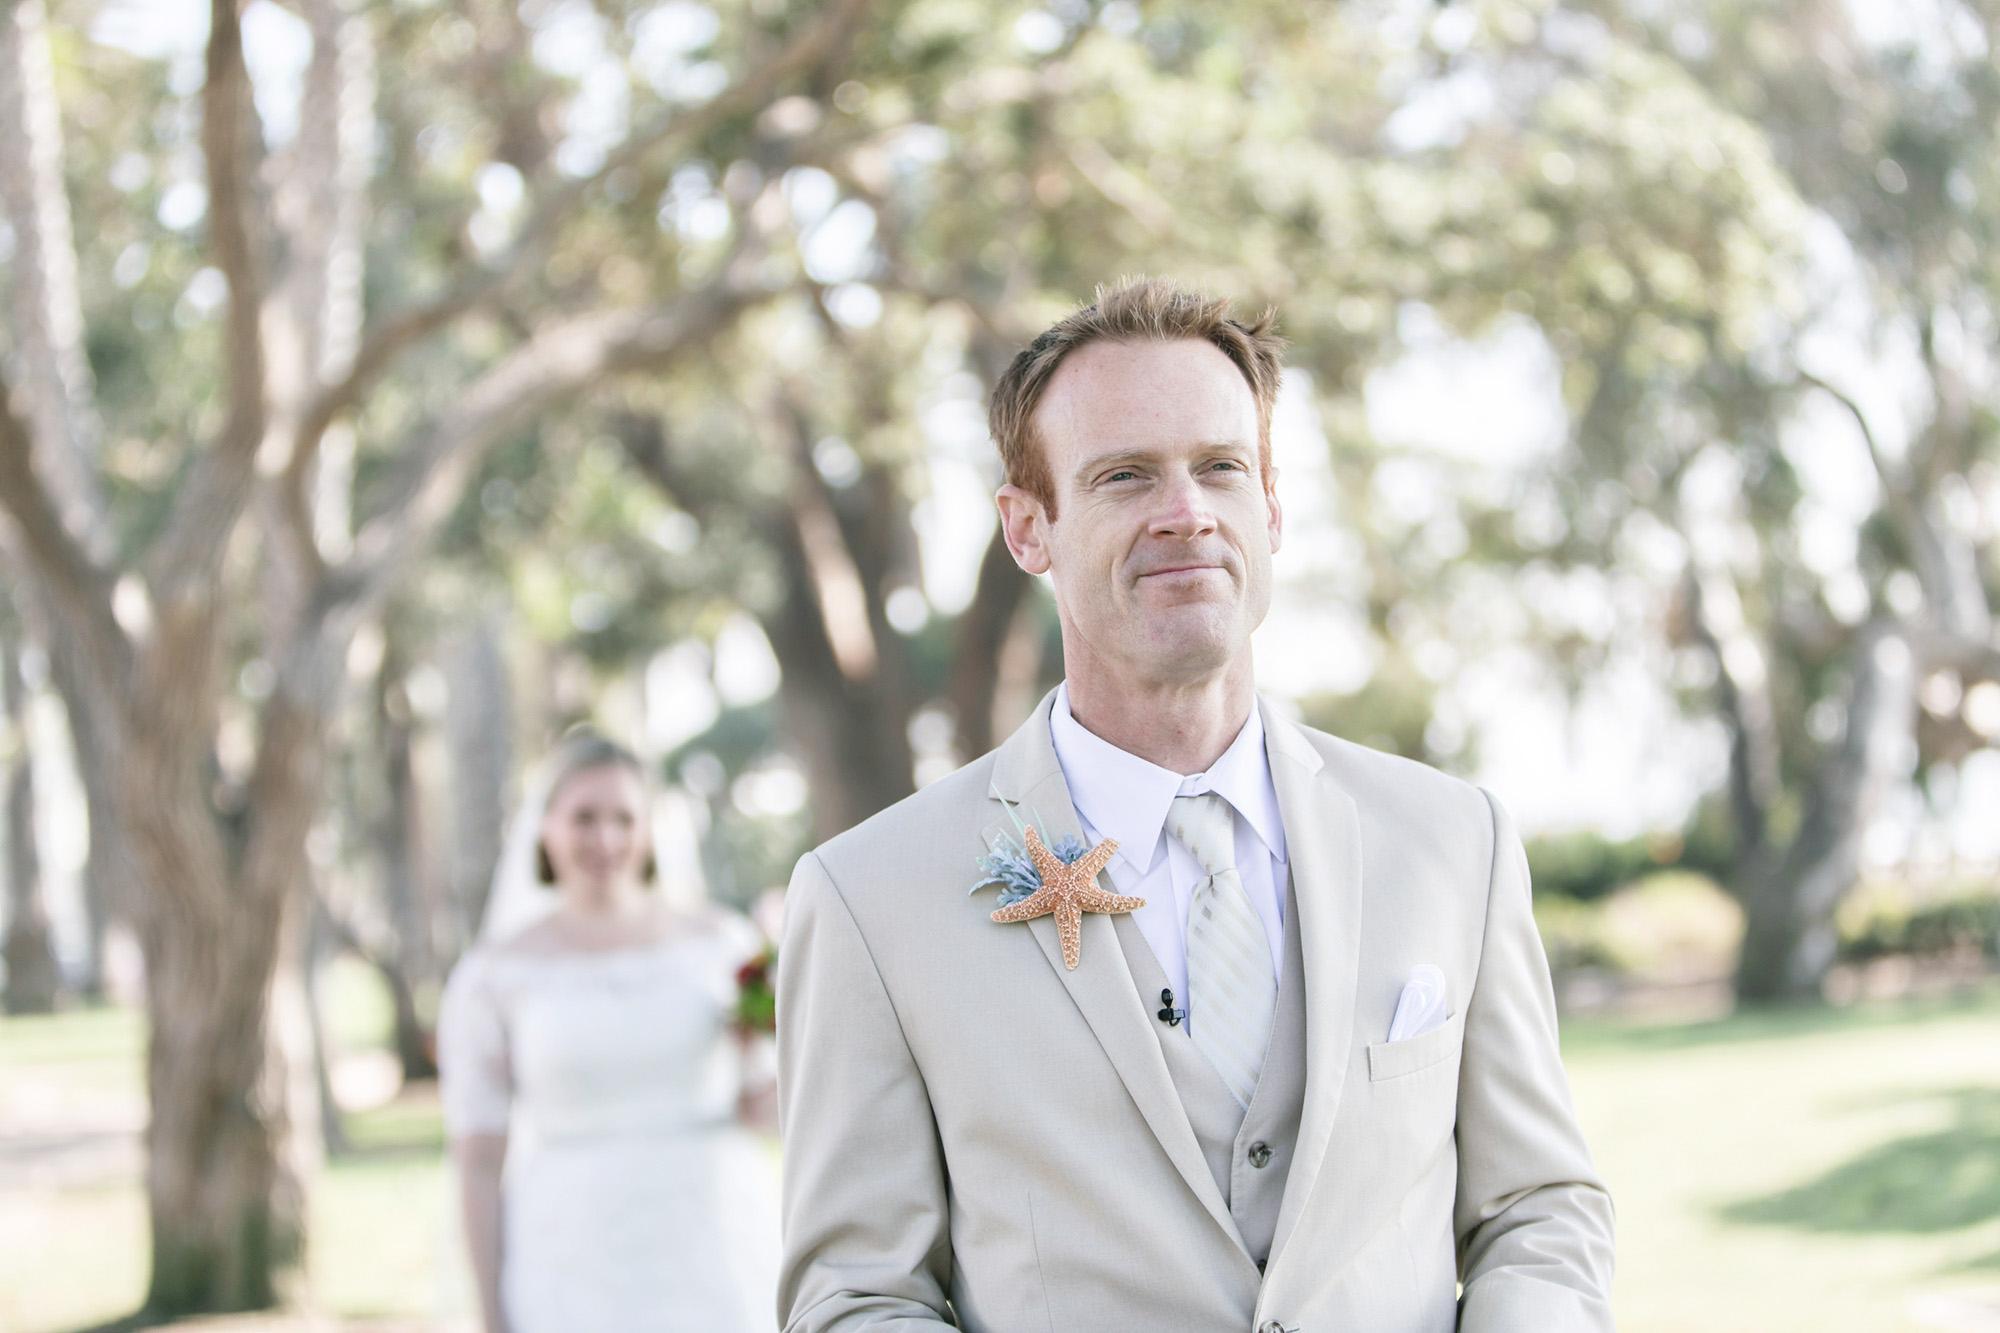 unforgettable-st-monica-wedding-carrie-vines-photography-020.jpg